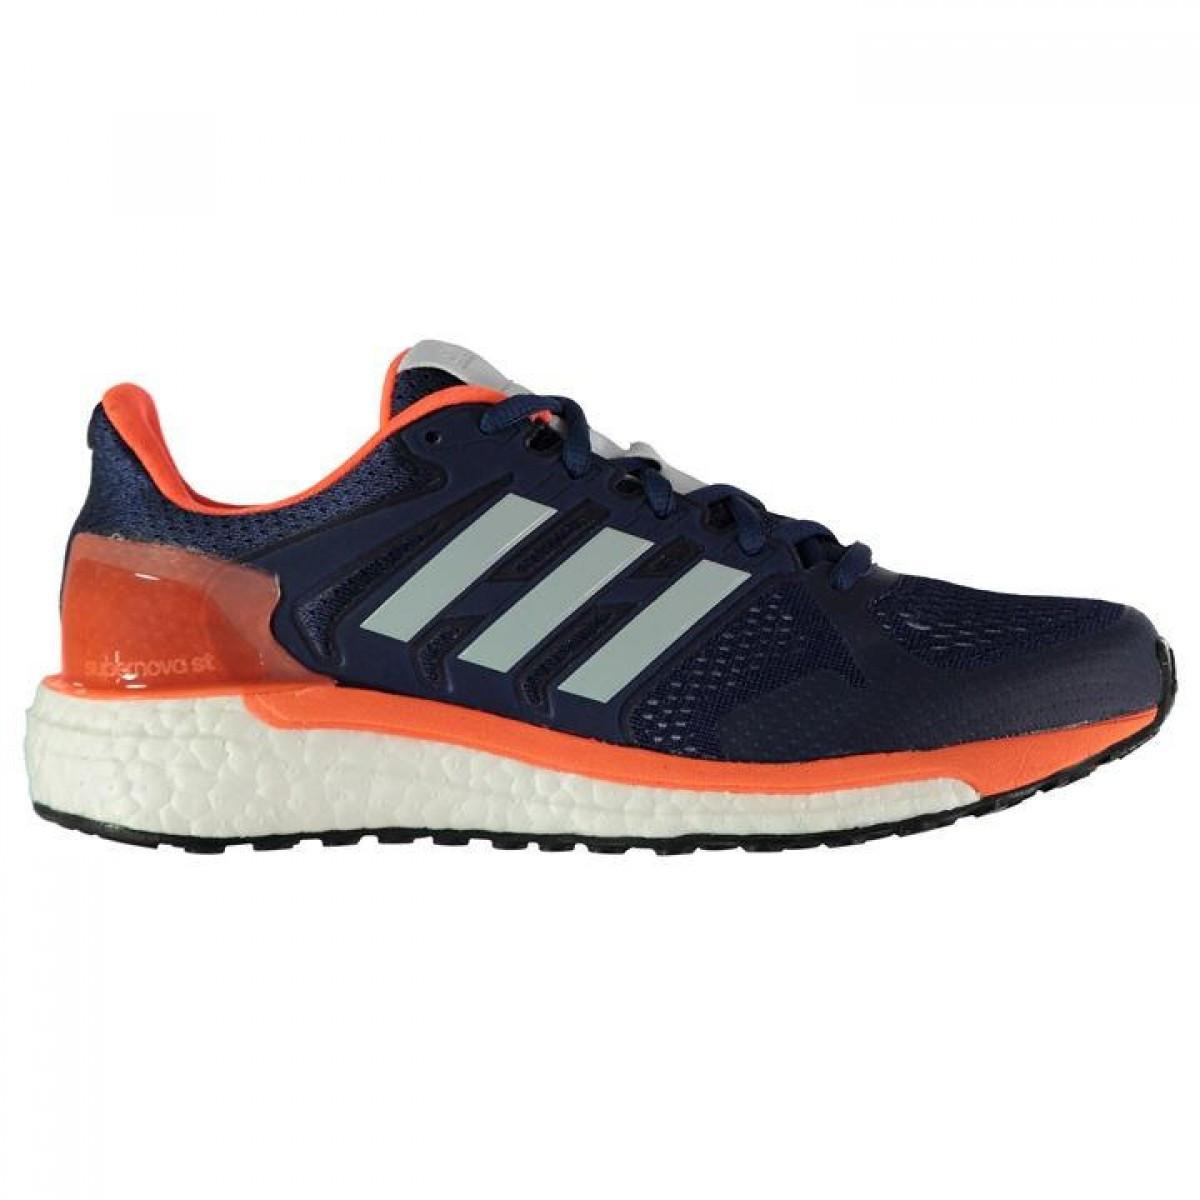 Кроссовки Adidas Supernova ST Ladies Blue/Orange - Оригинал, фото 1